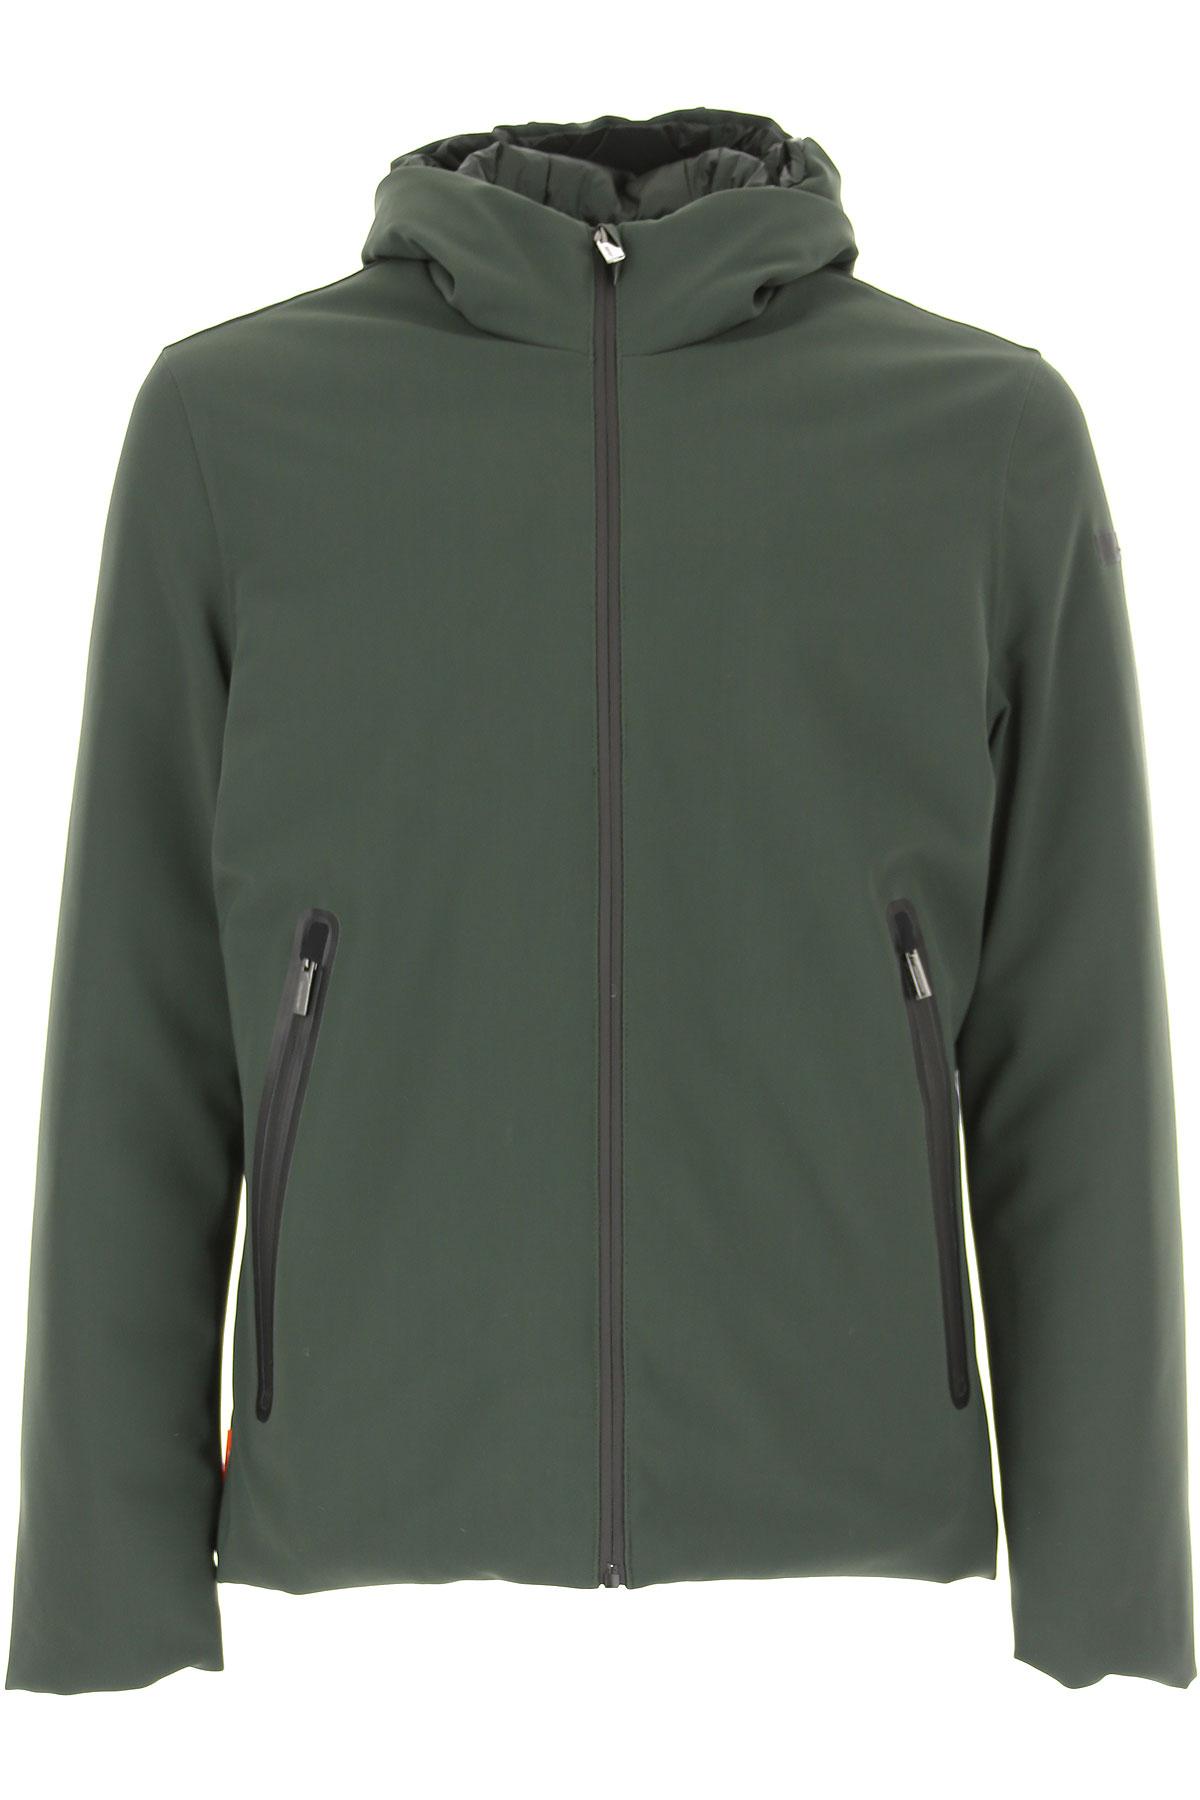 RRD Jacket for Men On Sale, Dark Green, polyamide, 2019, L M S XL XXL